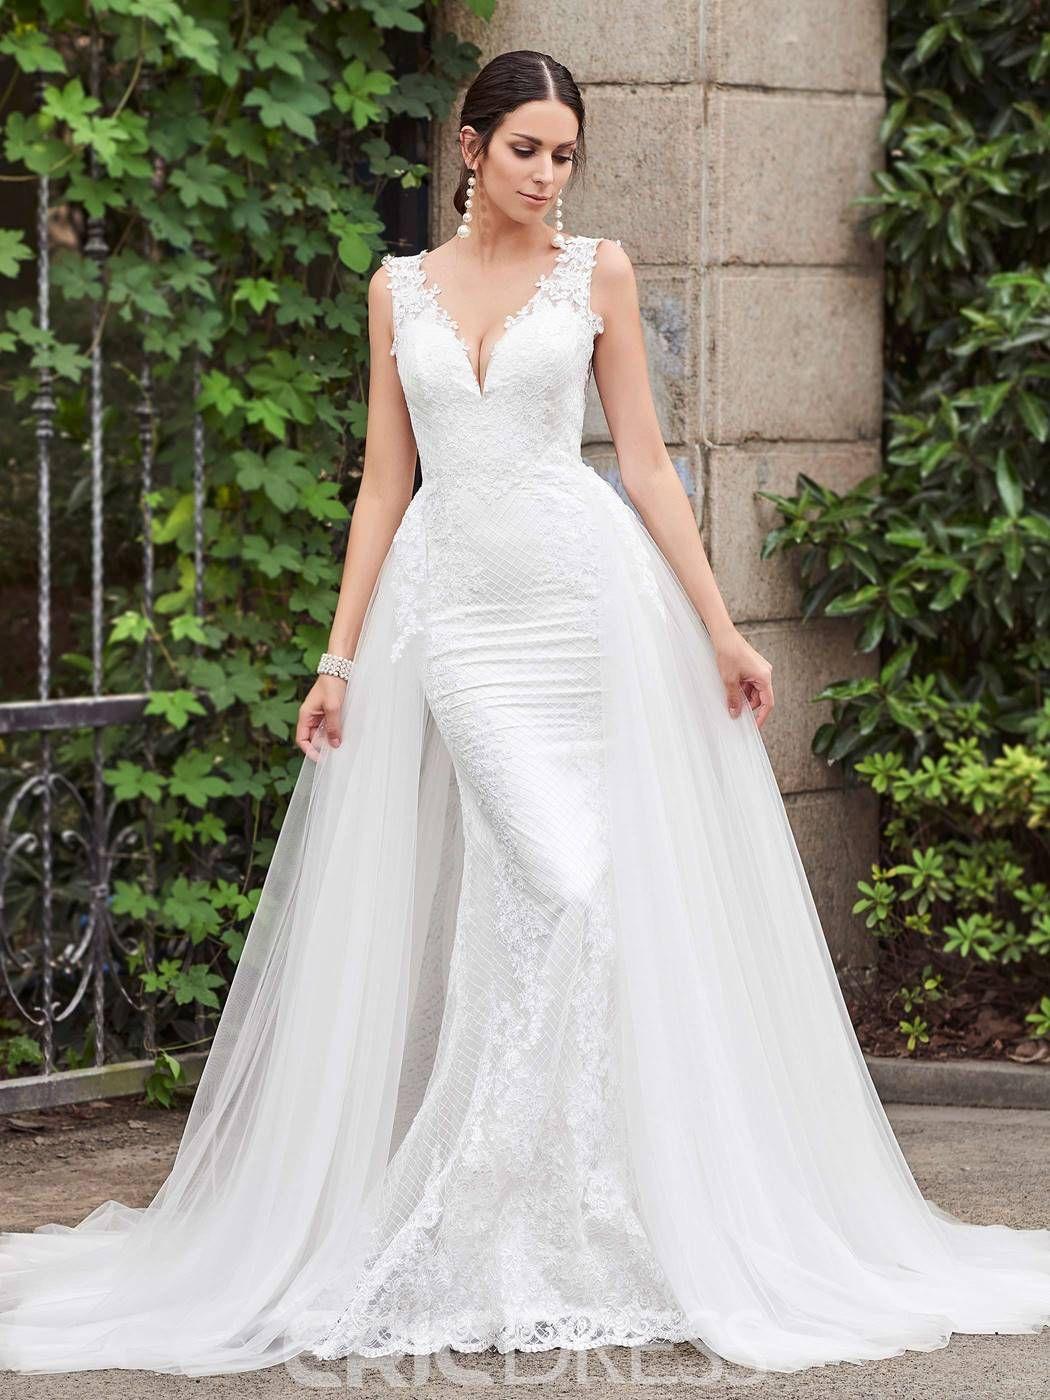 c7217b26813 Ericdress Charming V Neck Backless Mermaid Lace Wedding Dress ...